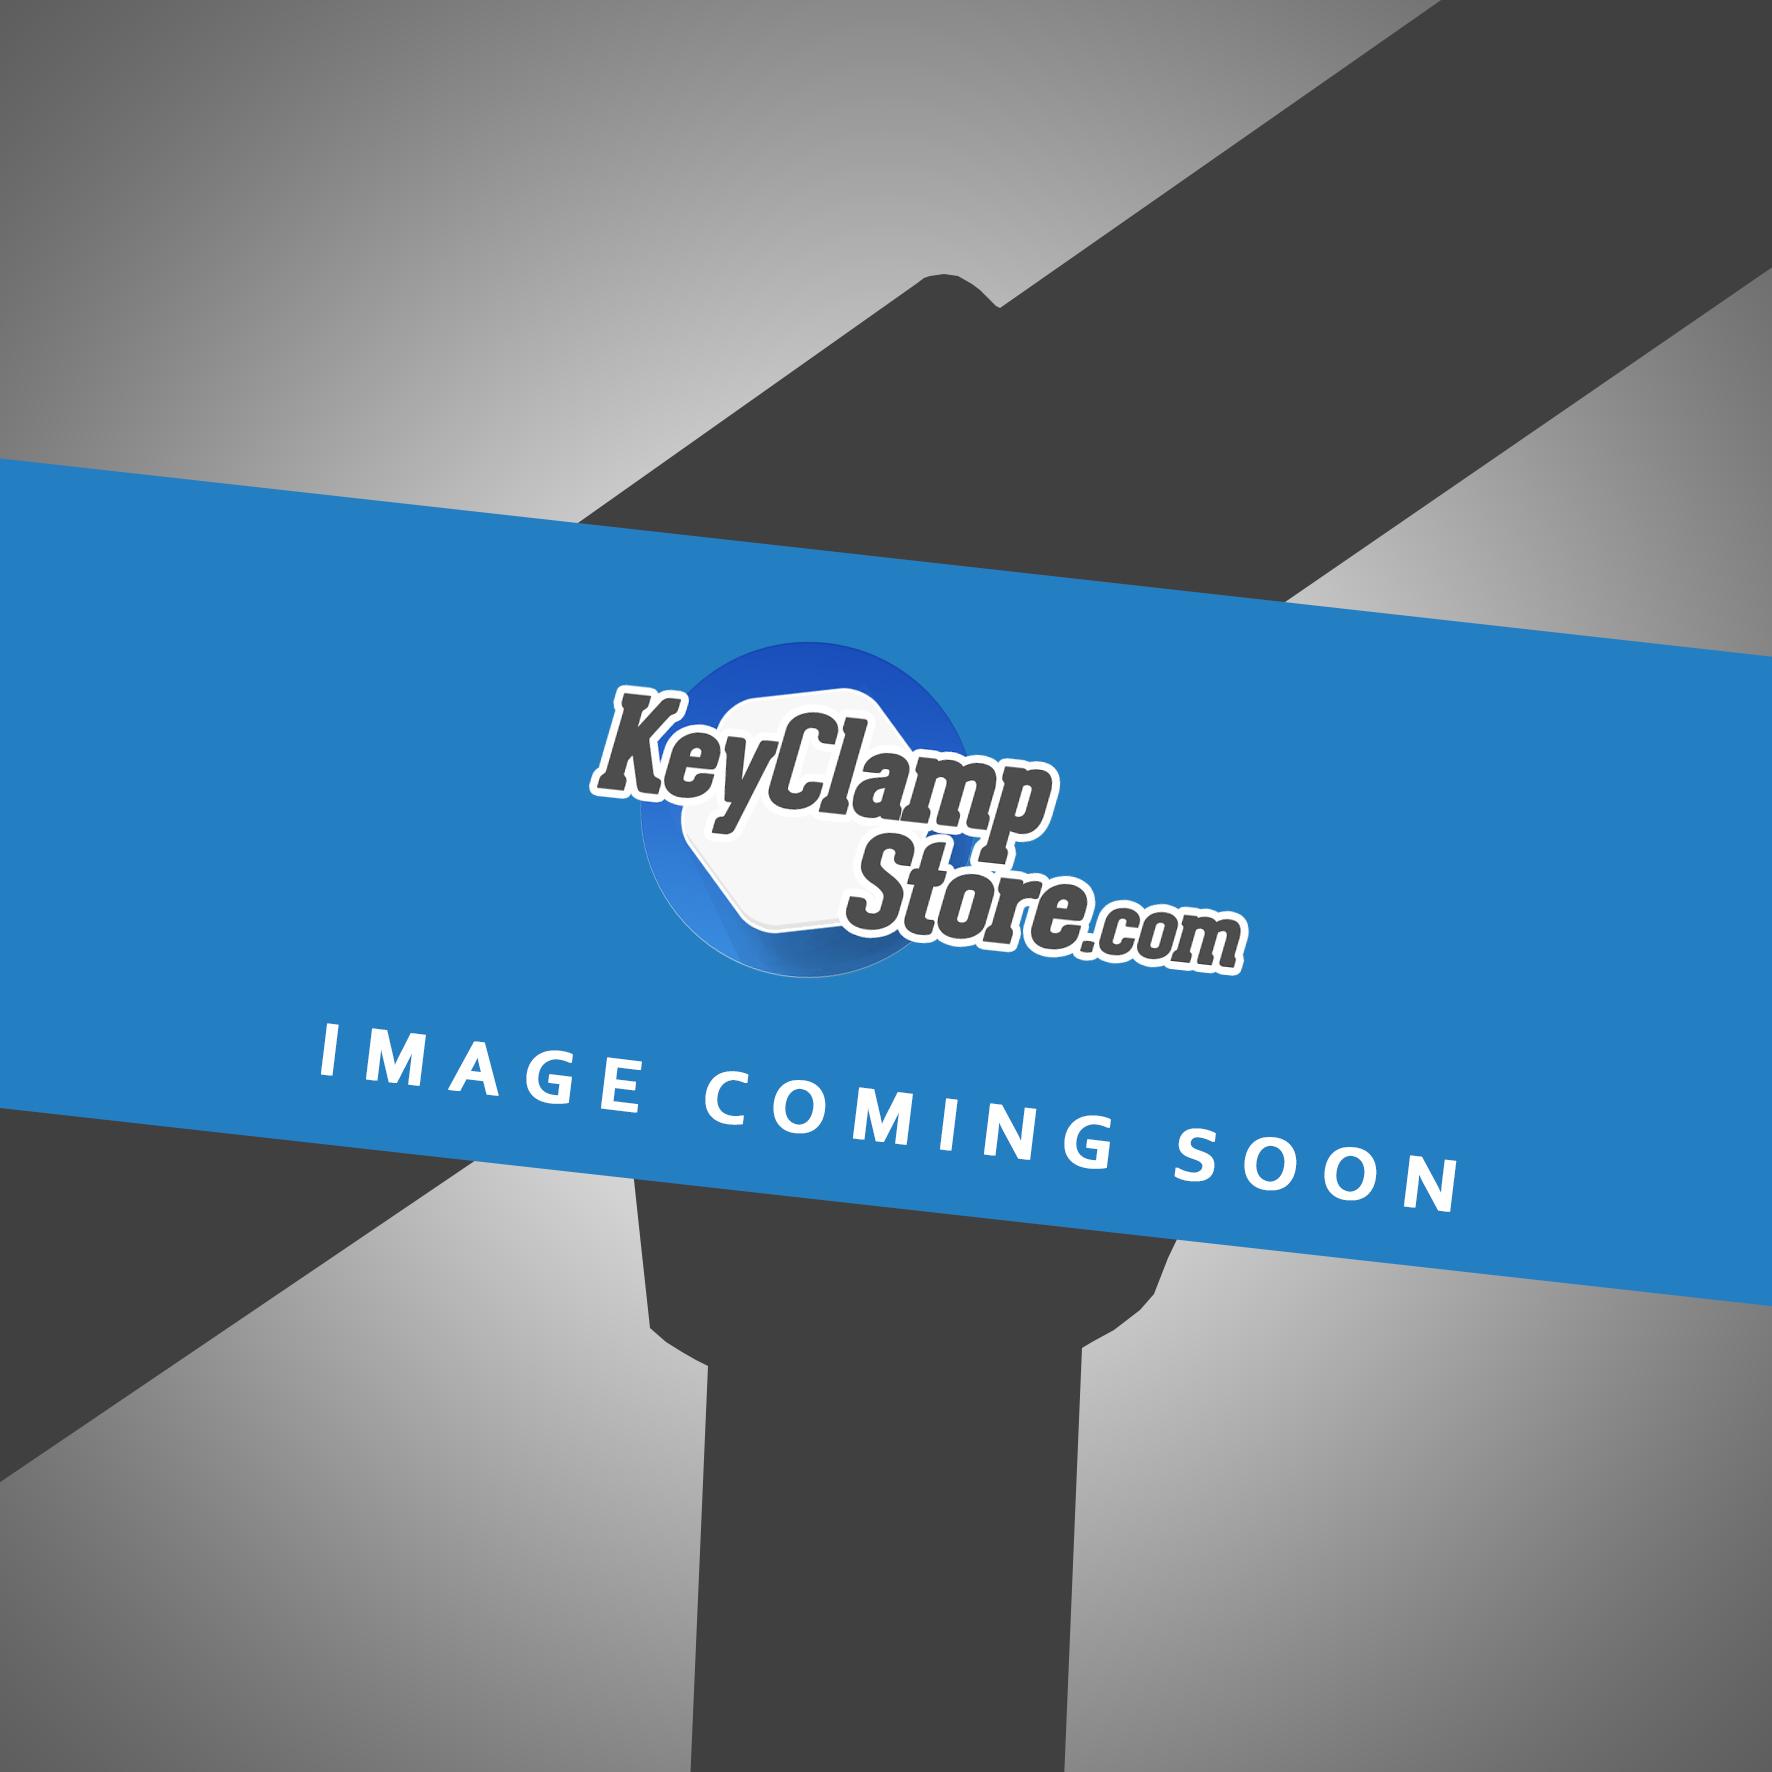 Key Clamp 131 B34 Wall Plate 34mm 131 34 B Flange 61 61 6